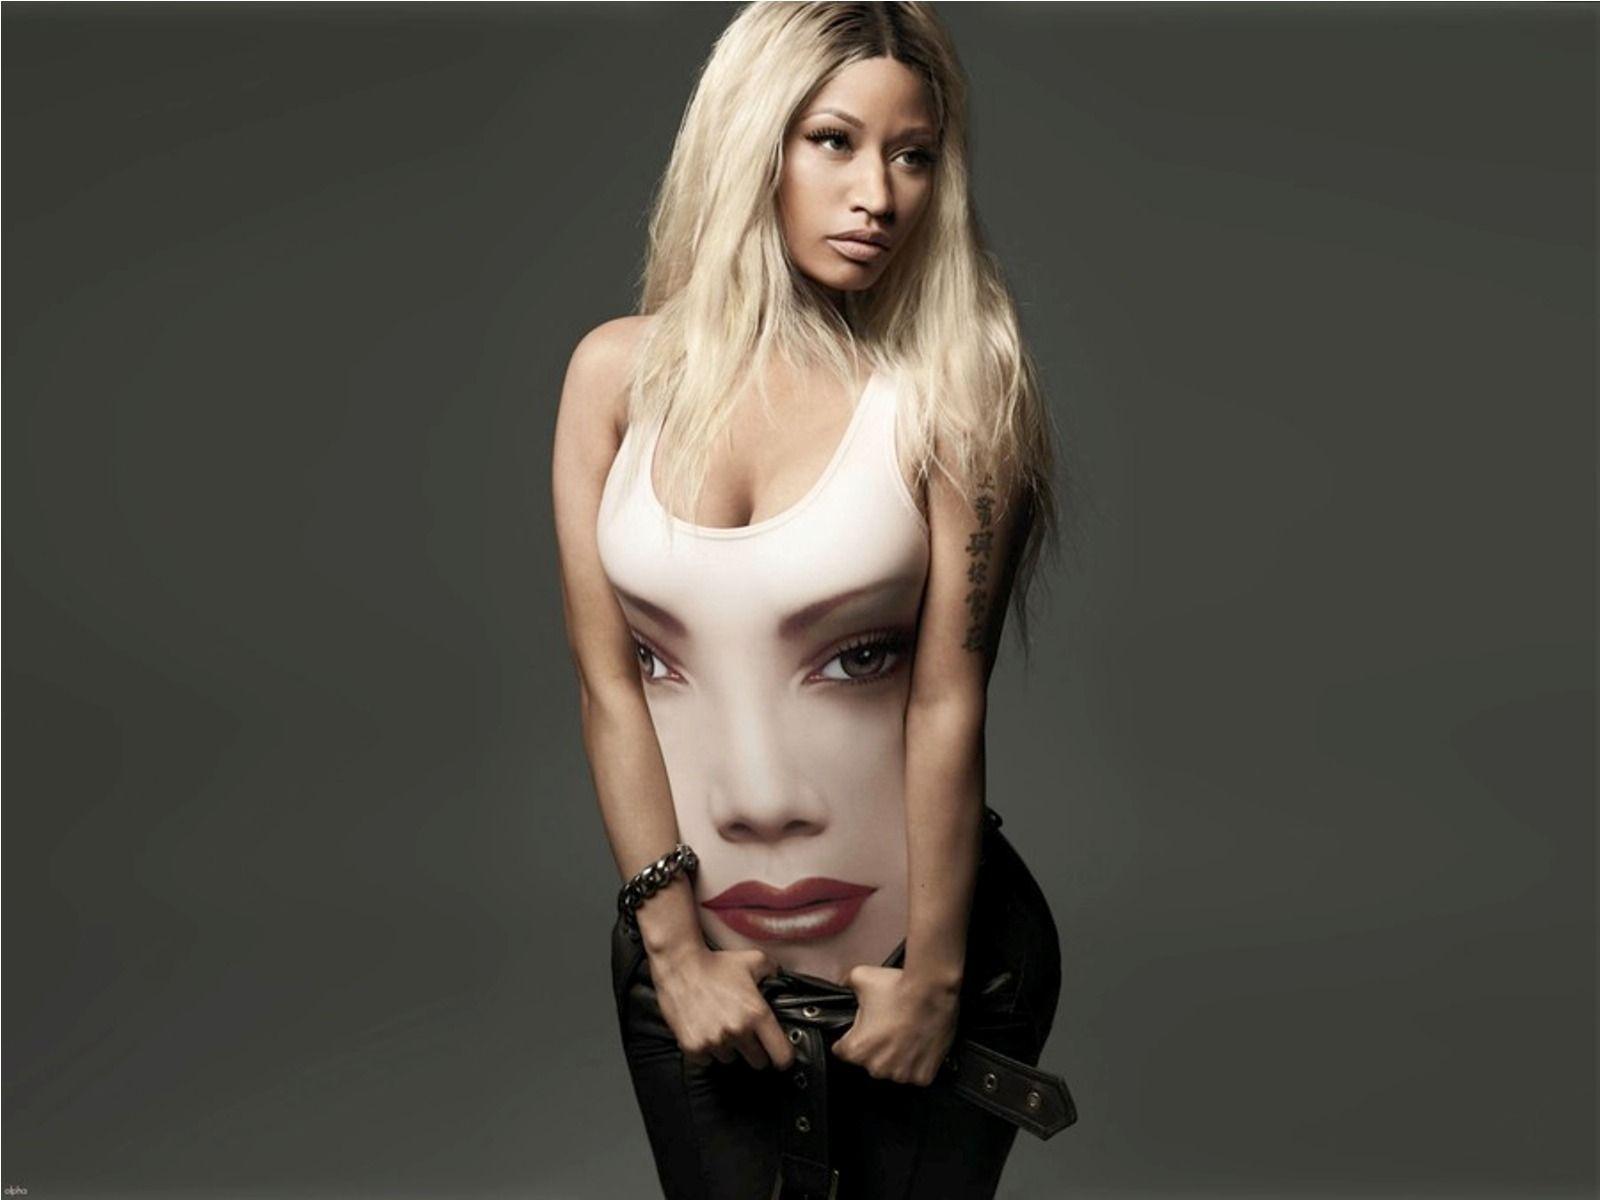 Nicki Minaj Wallpaper #18